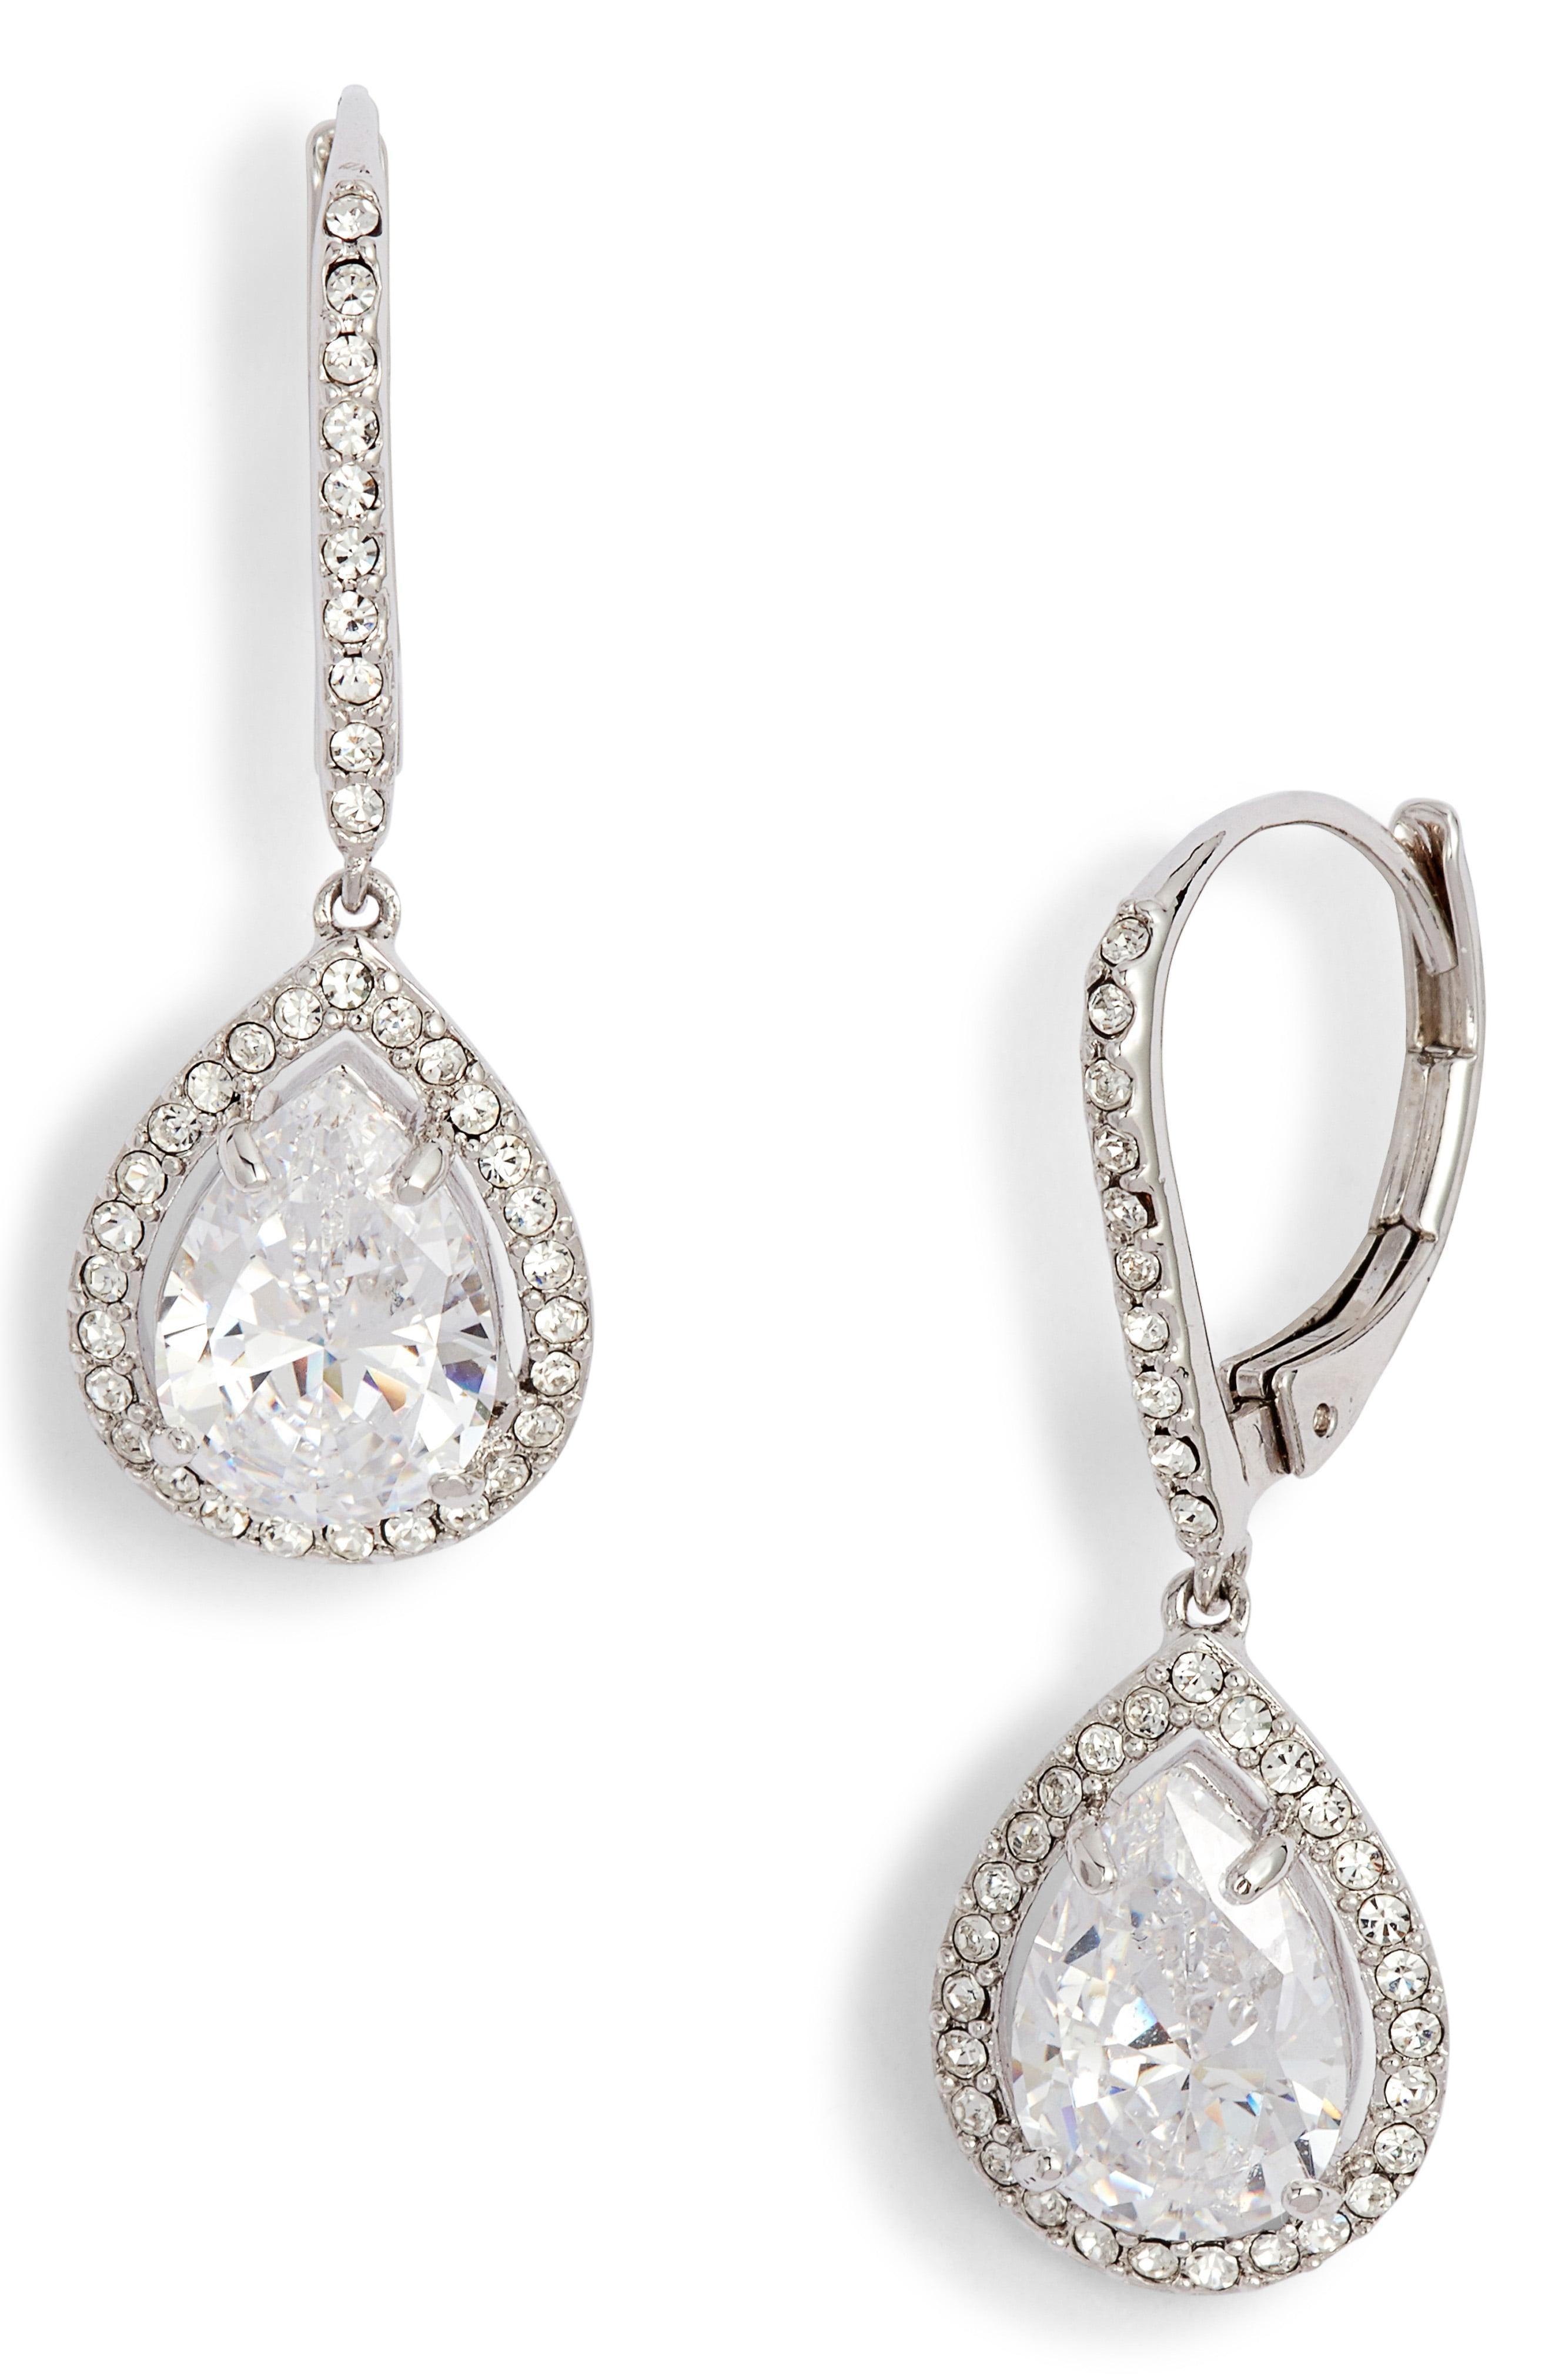 ab693eab5dd8b8 Lyst - Nordstrom Cubic Zirconia Drop Earrings in Metallic